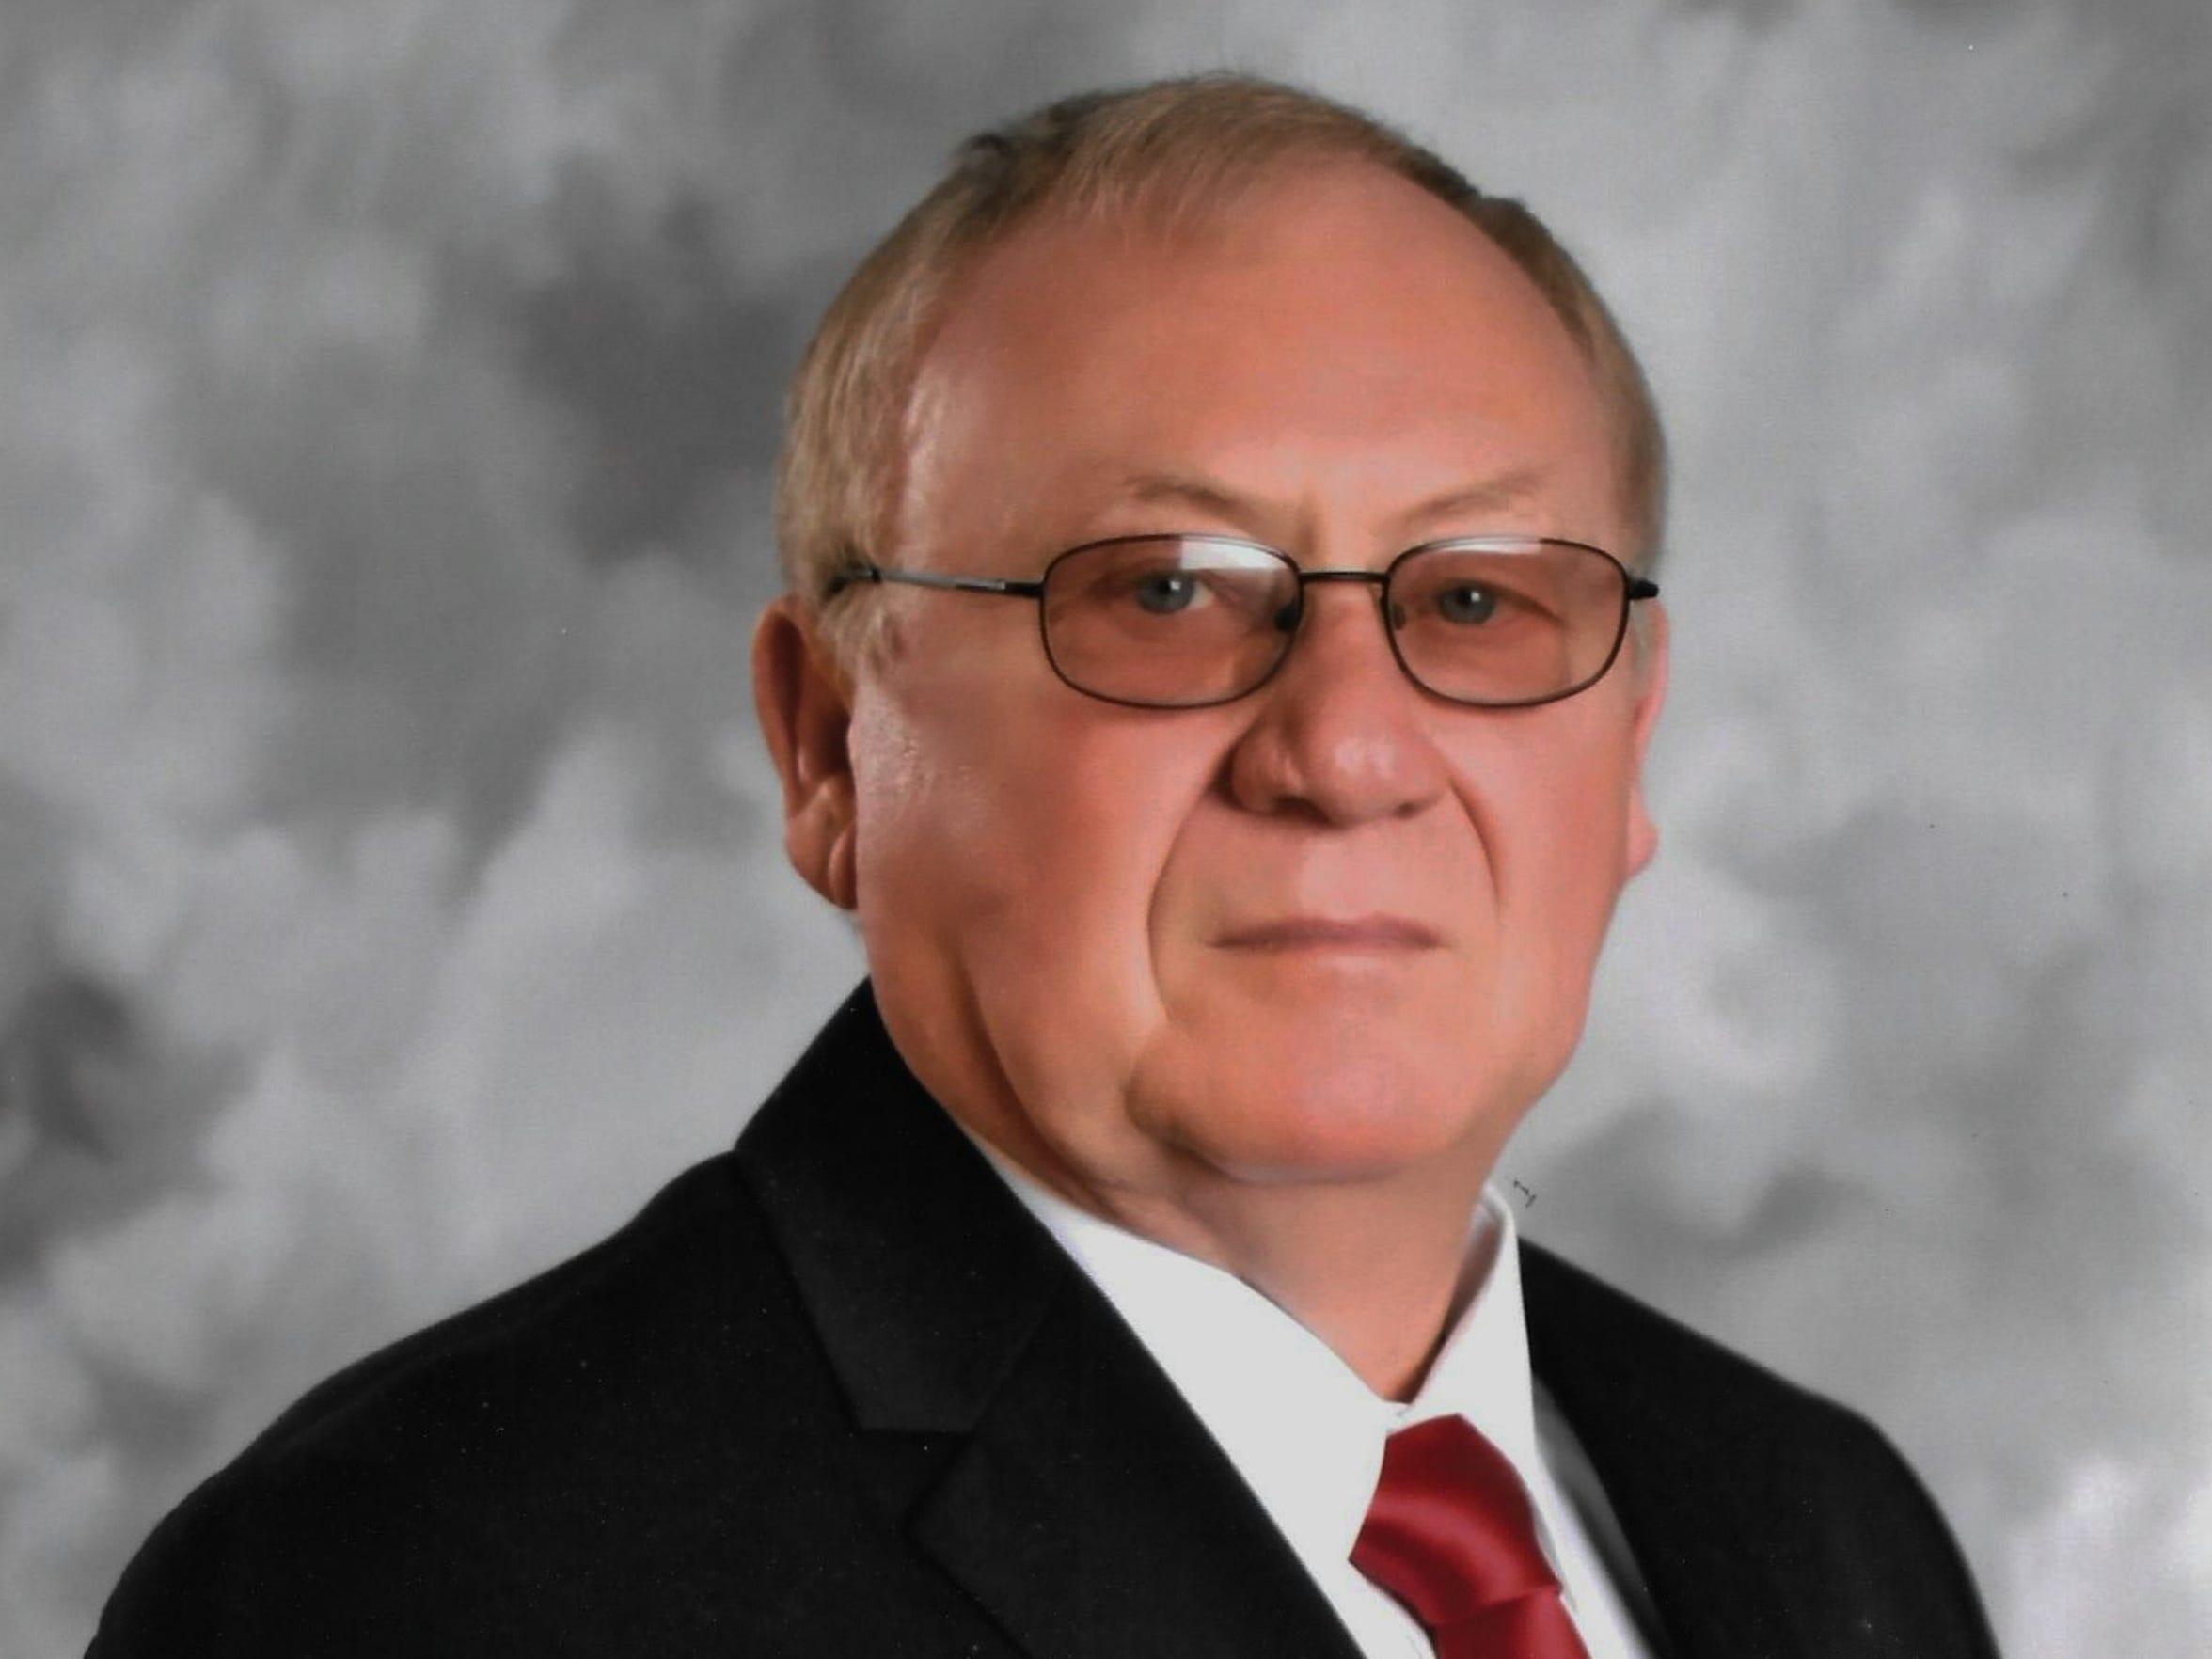 Delbert Slusher, Republican candidate for Pike County